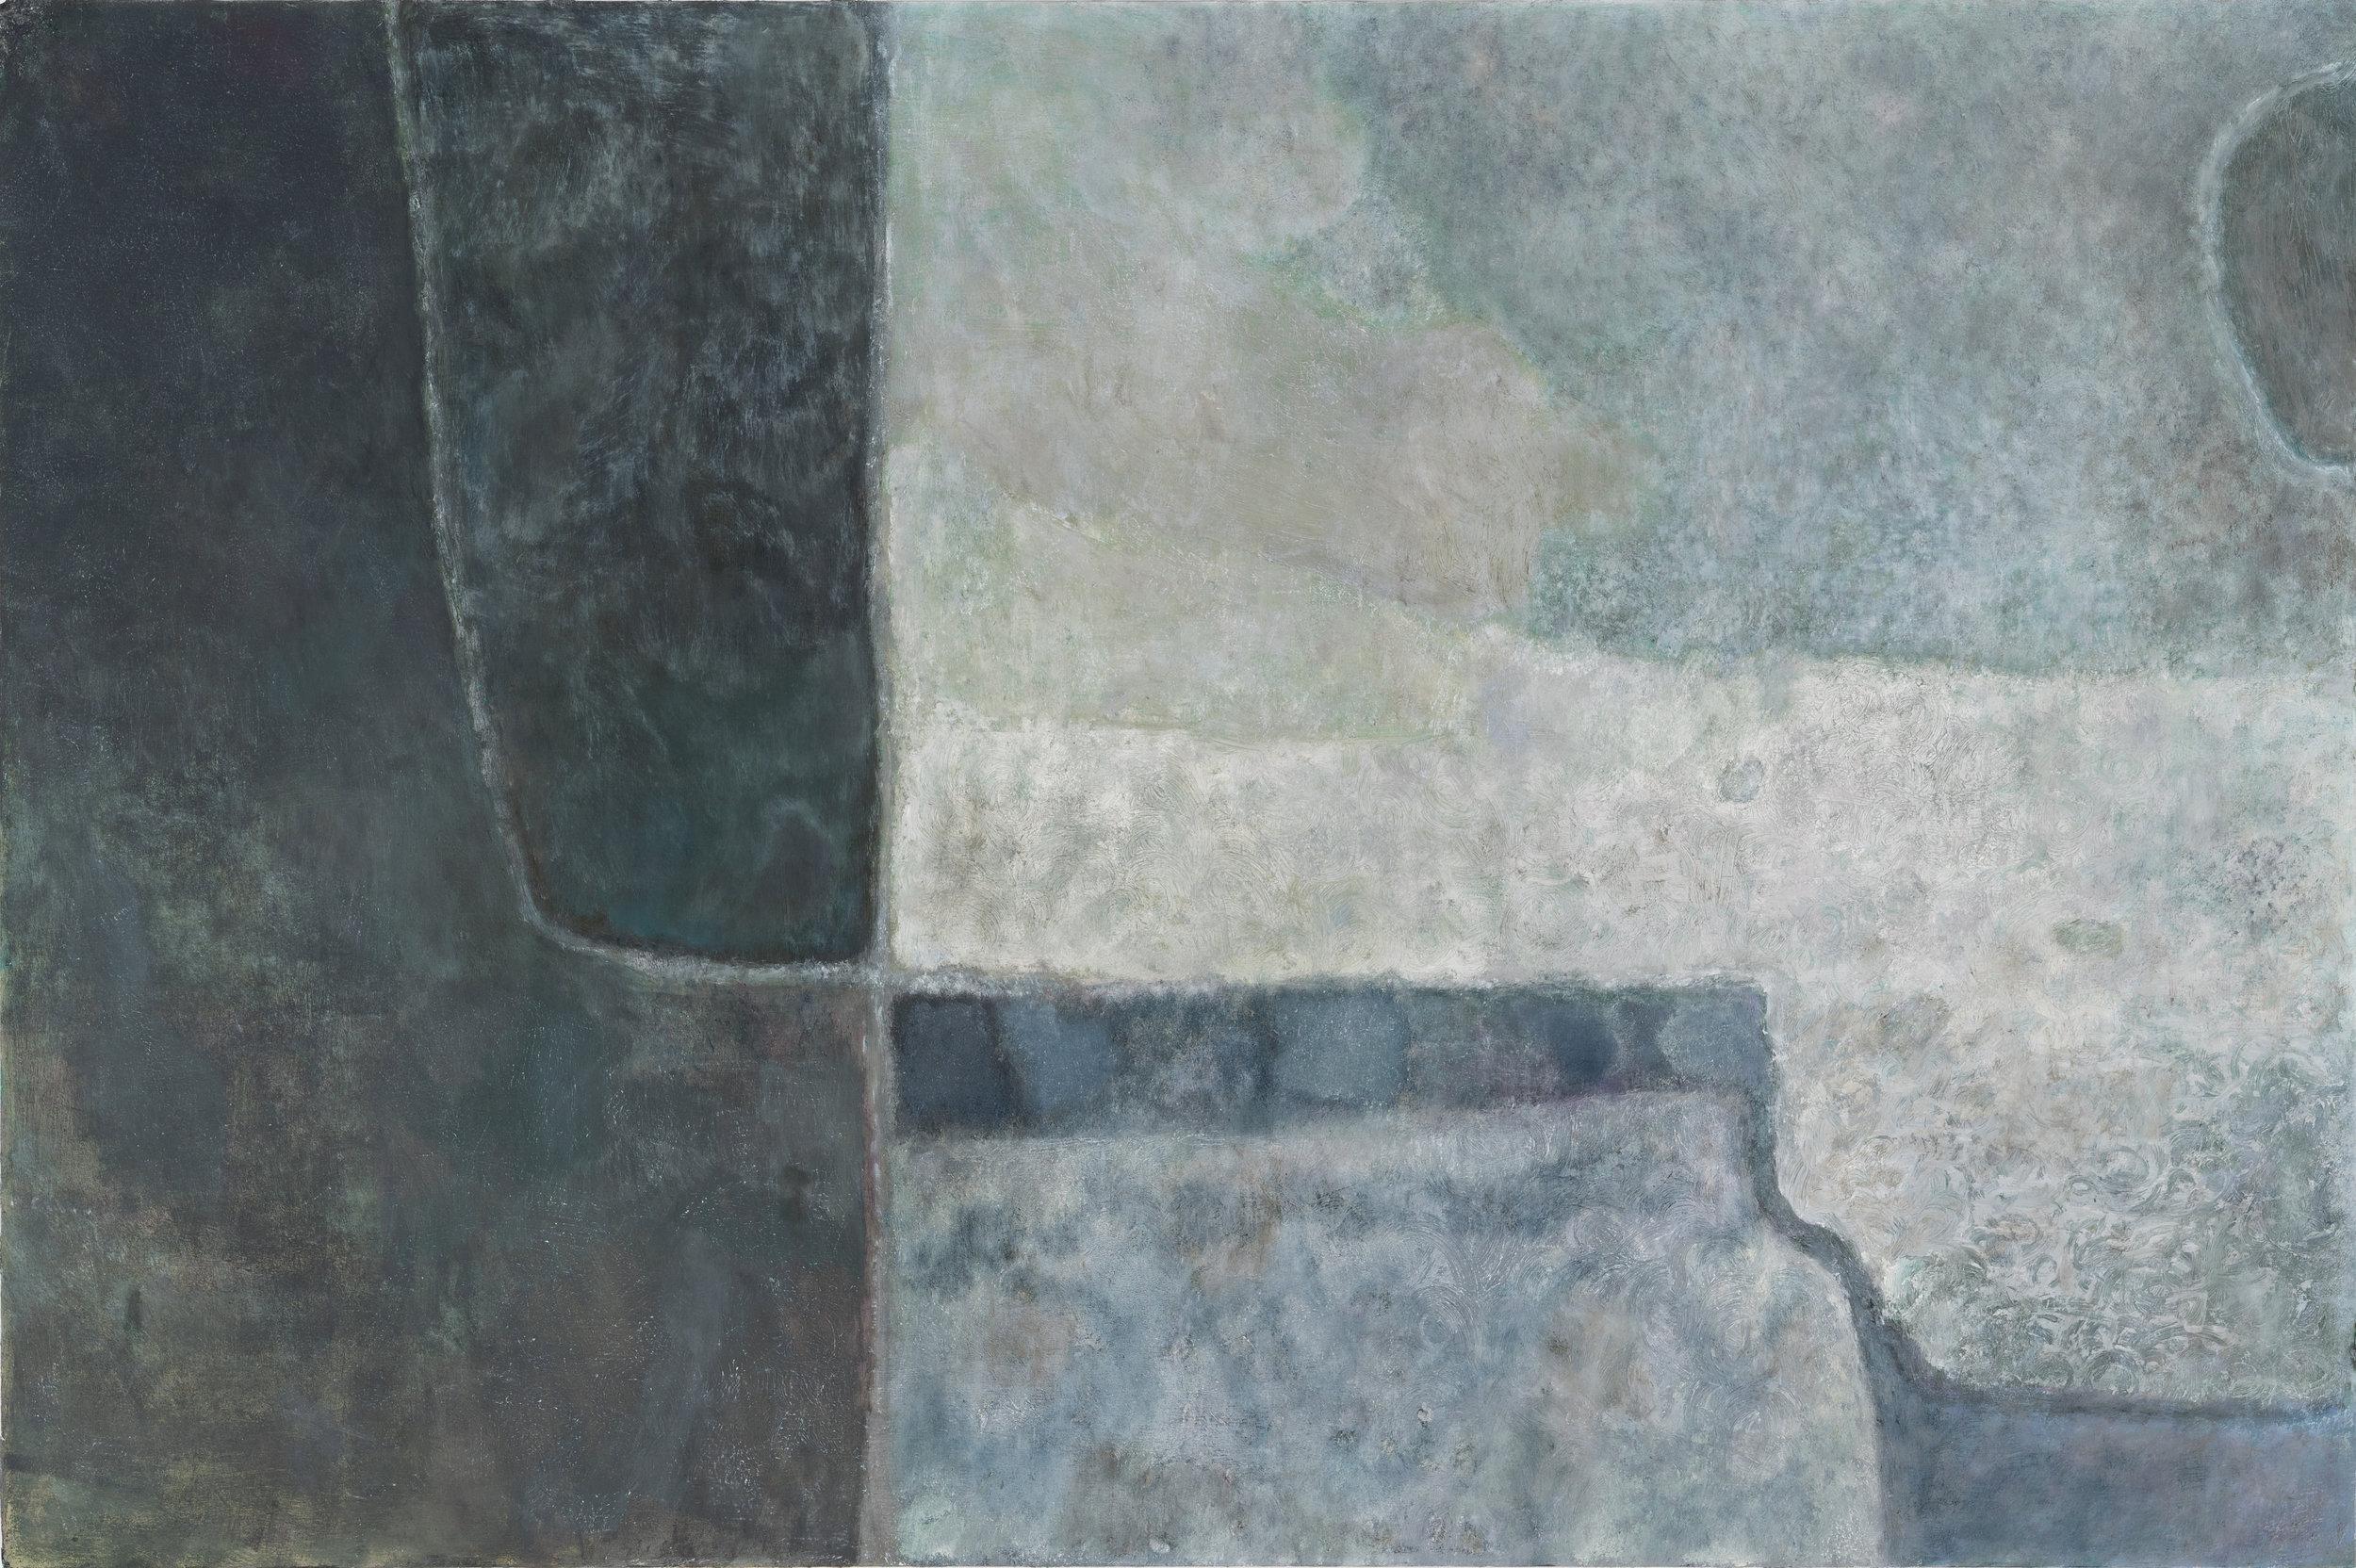 "Laurence Pilon,  Secret Meadows (Still) , 2018, oil on wood panel, 24"" x 36"" (61 x 92 cm)"